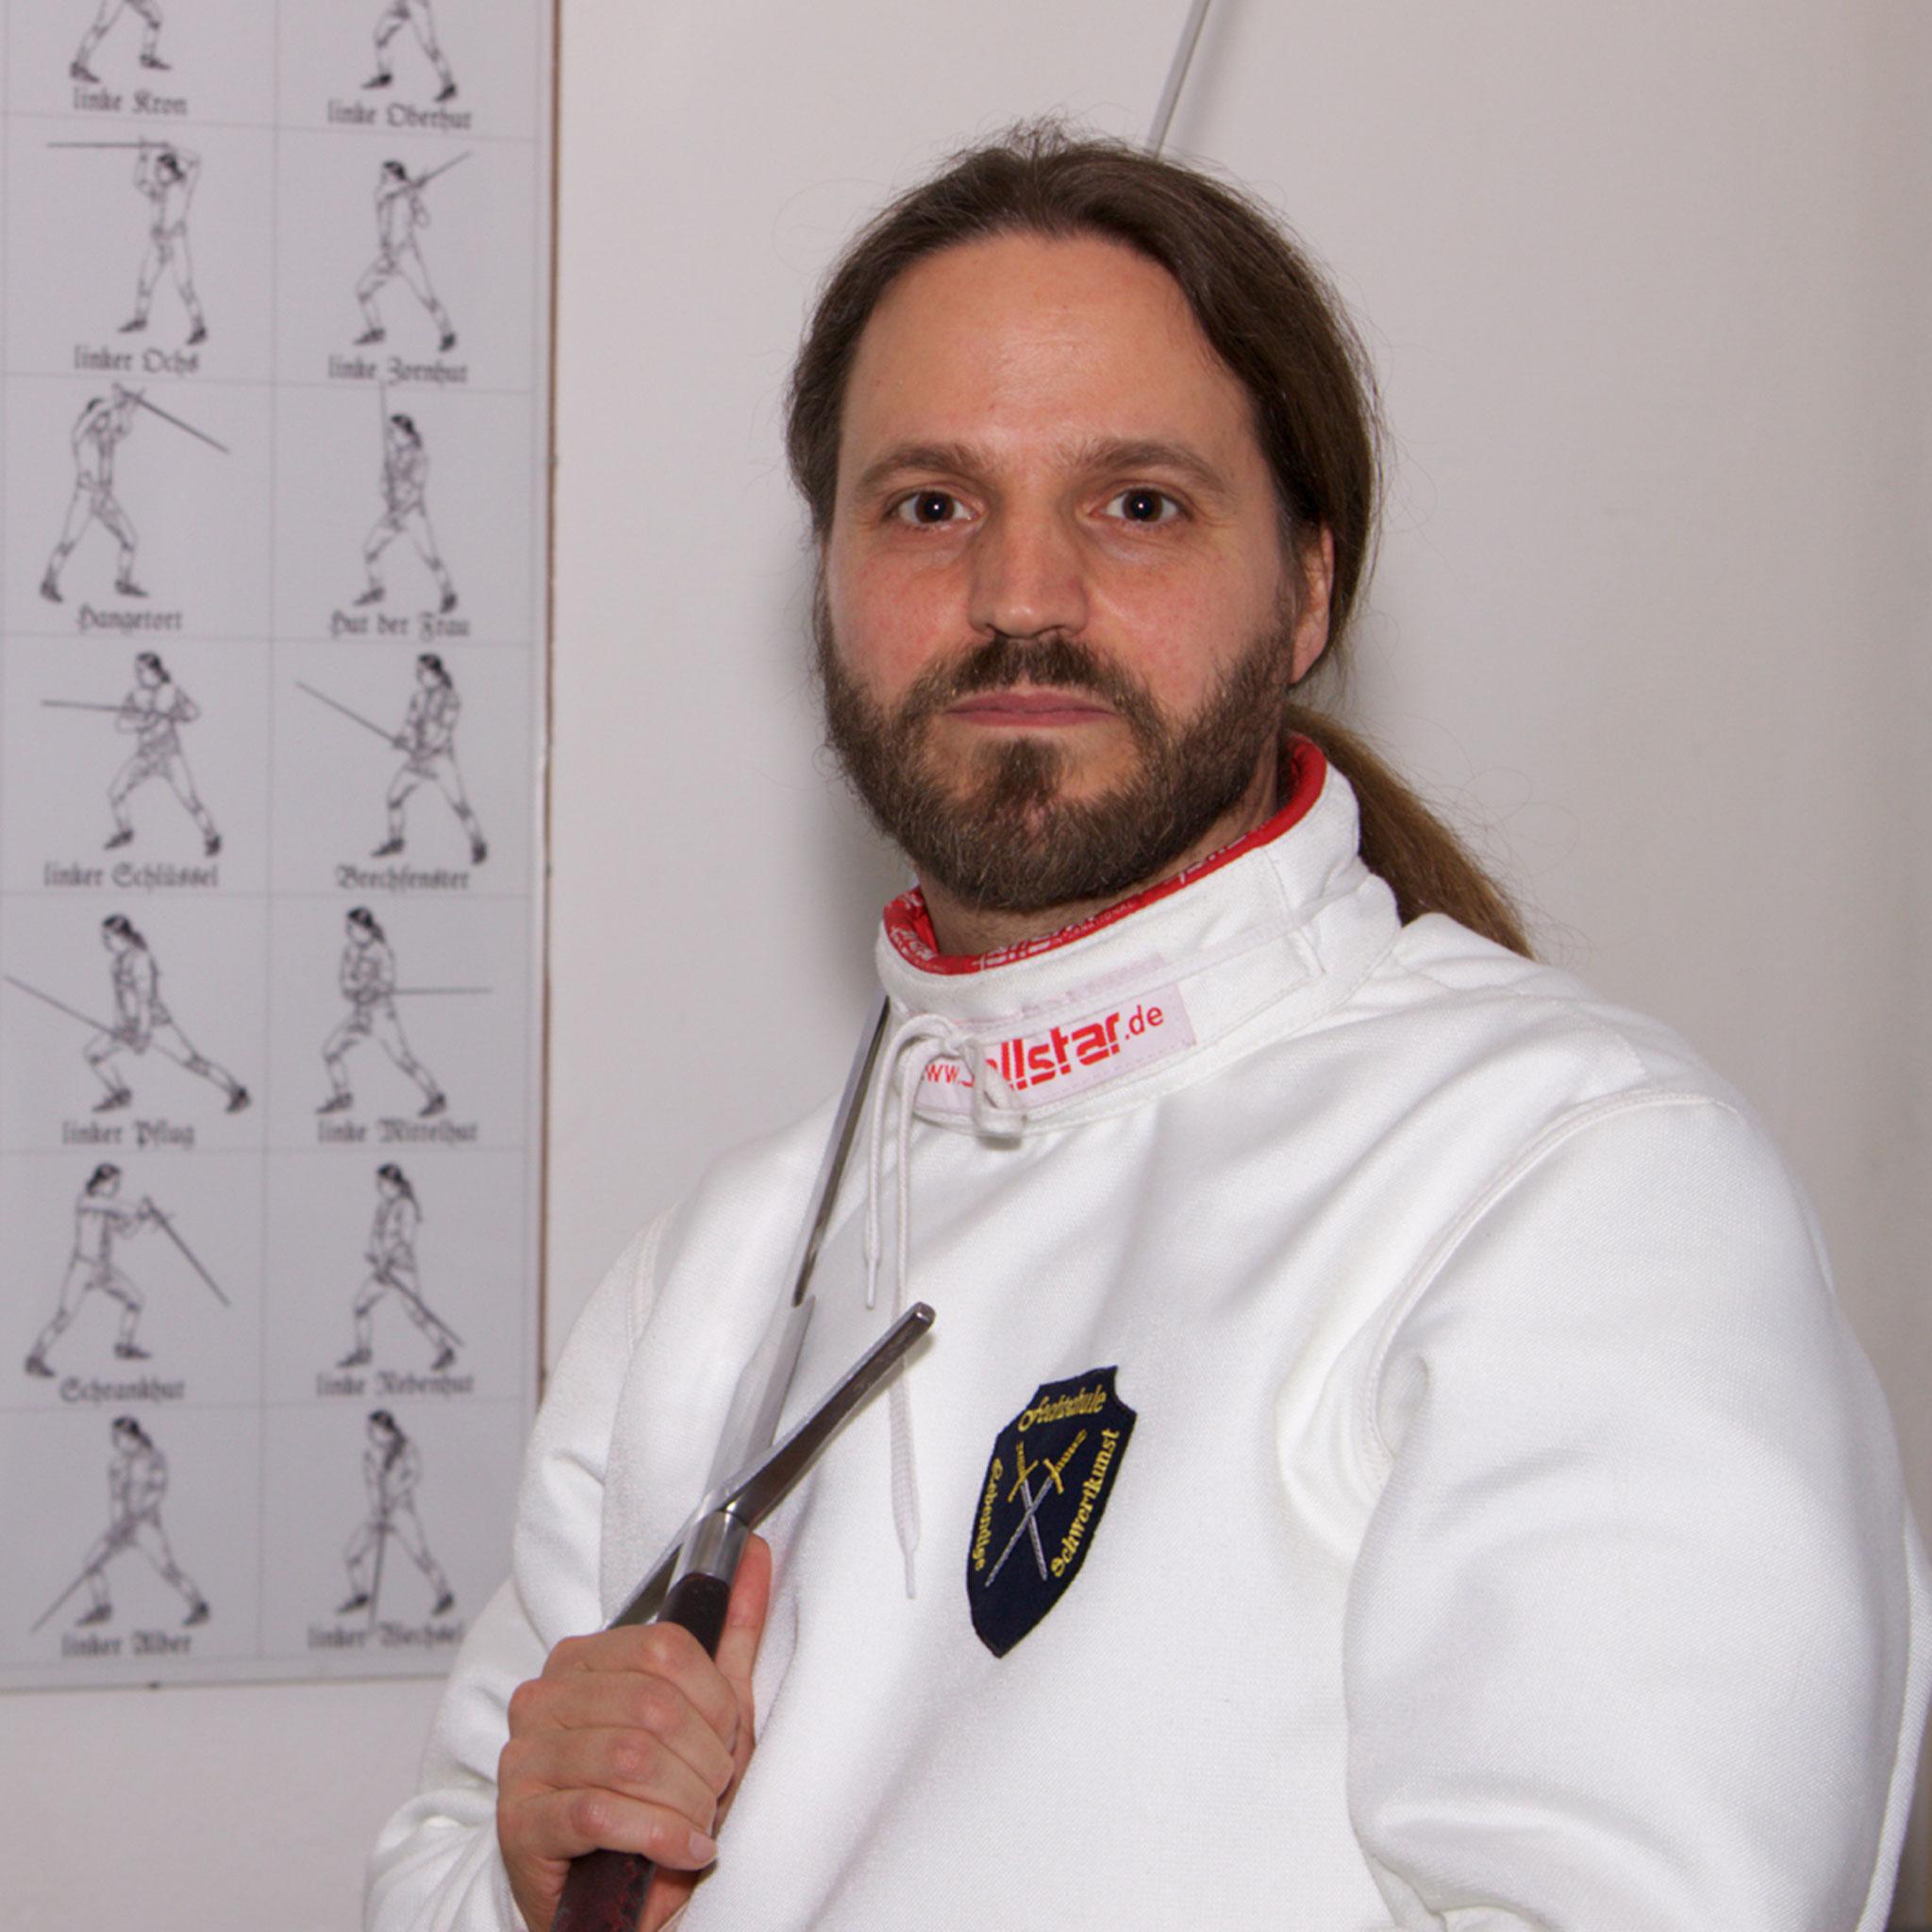 Wolfgang Abart